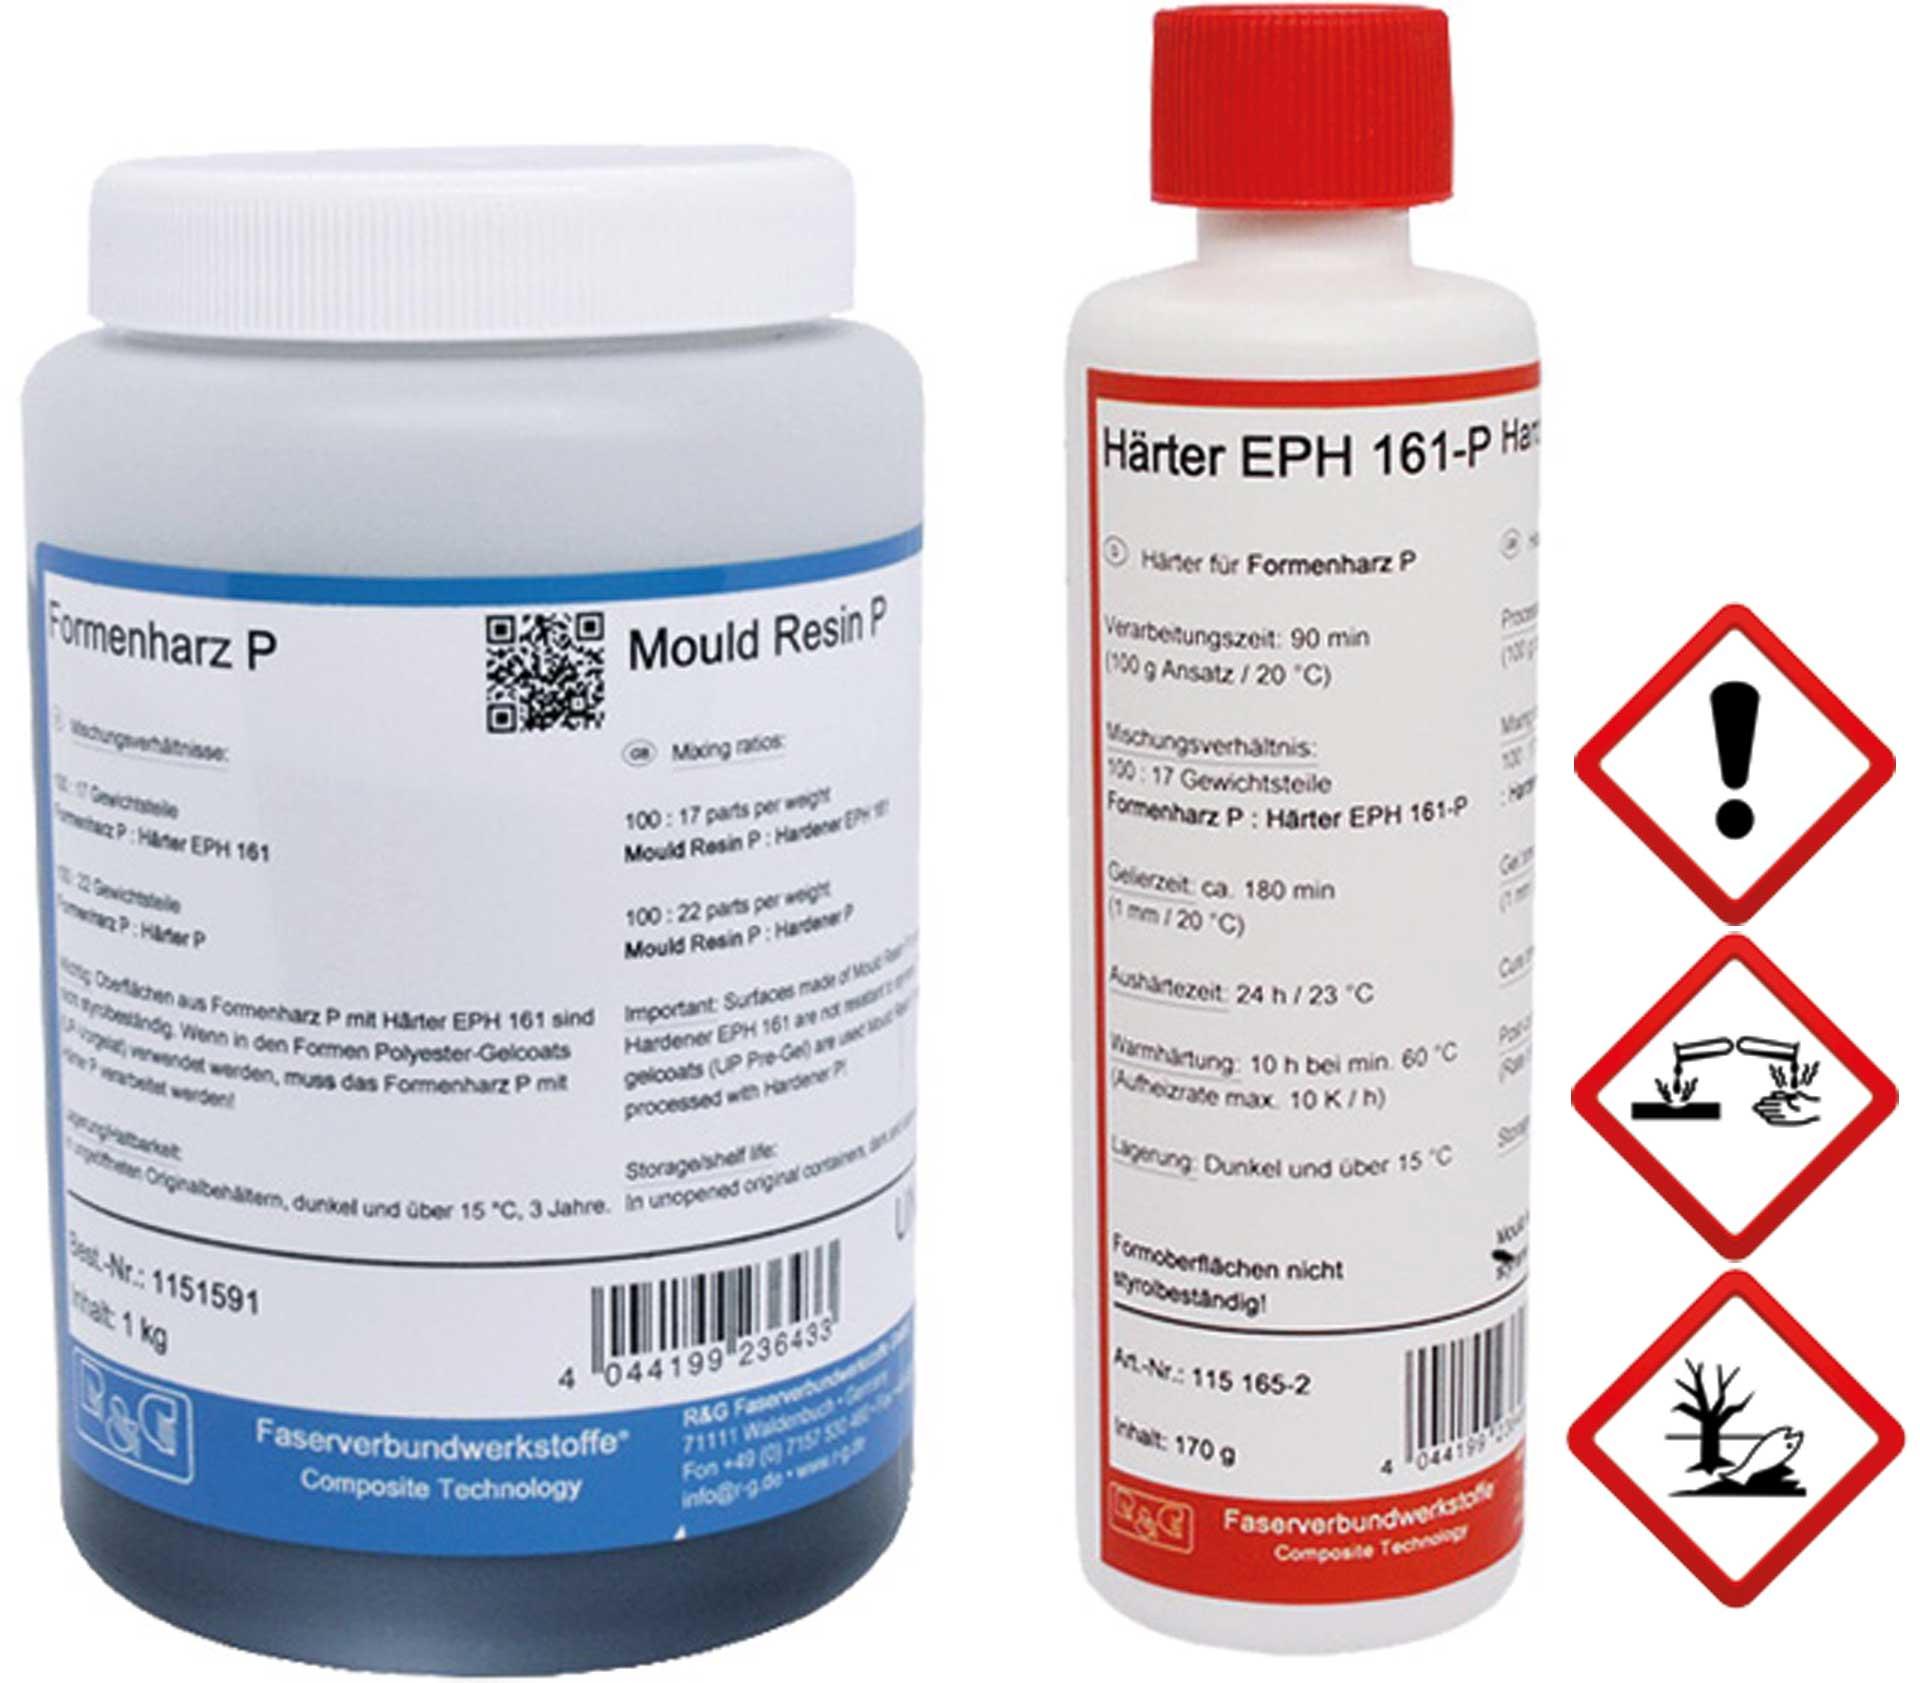 R&G Formenharz P + Härter (EPH 161-P) Packung/ 585 g